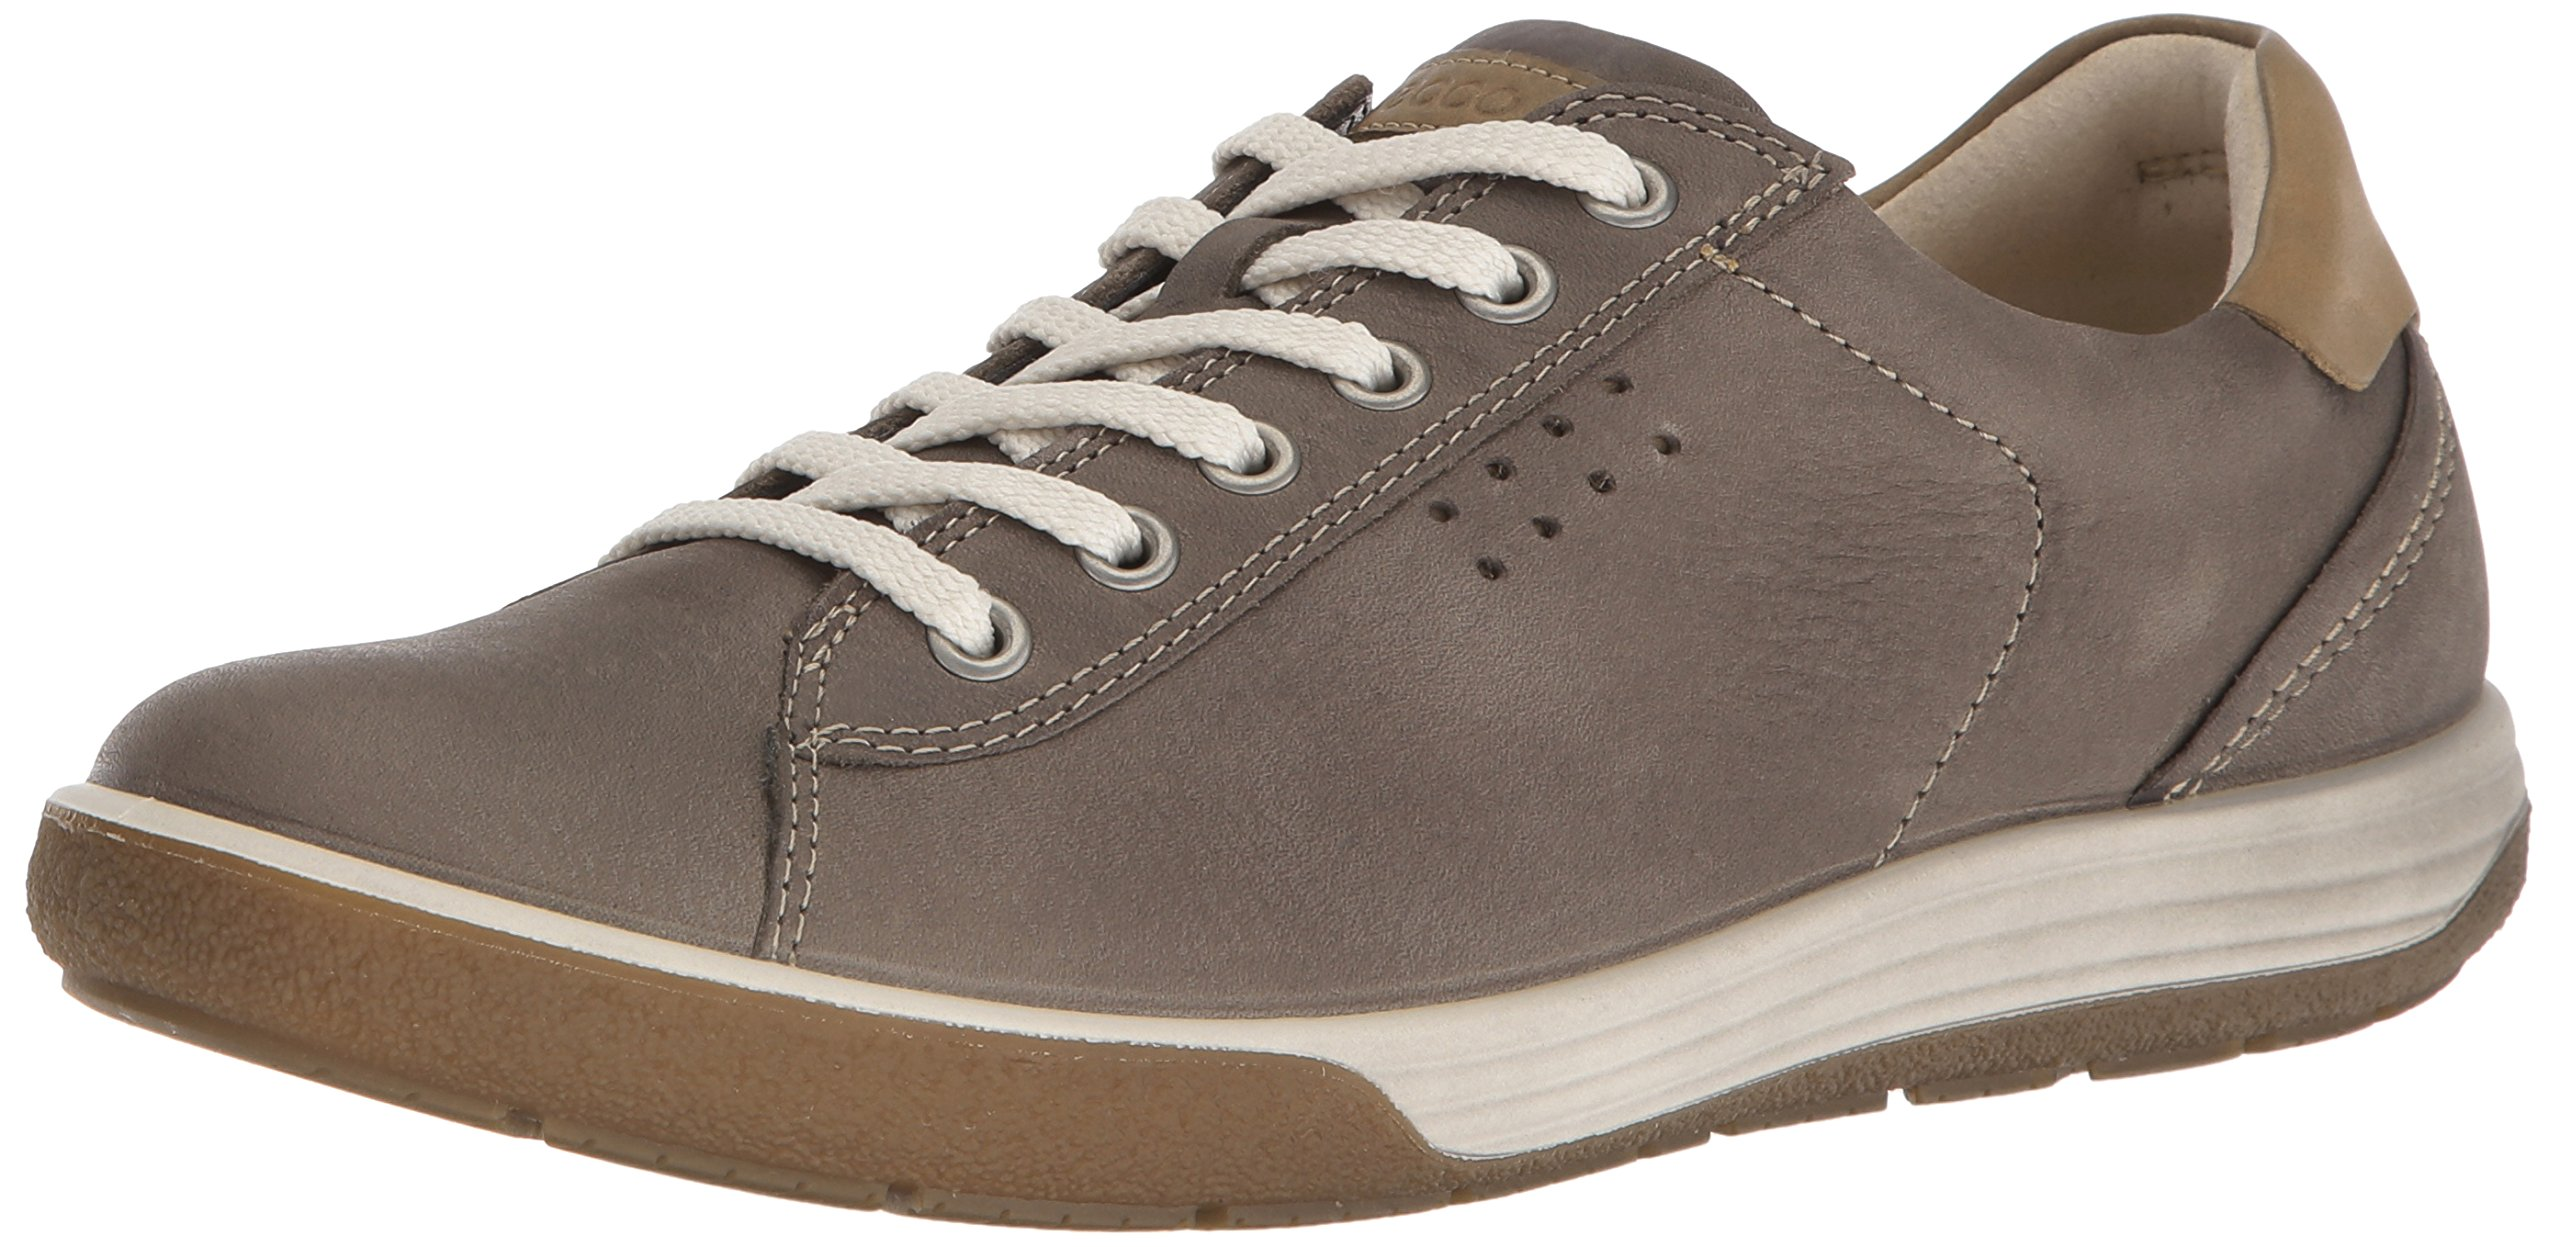 Ecco Footwear Womens Chase II Lace Shoe, Warm Grey, 39 EU/8-8.5 M US